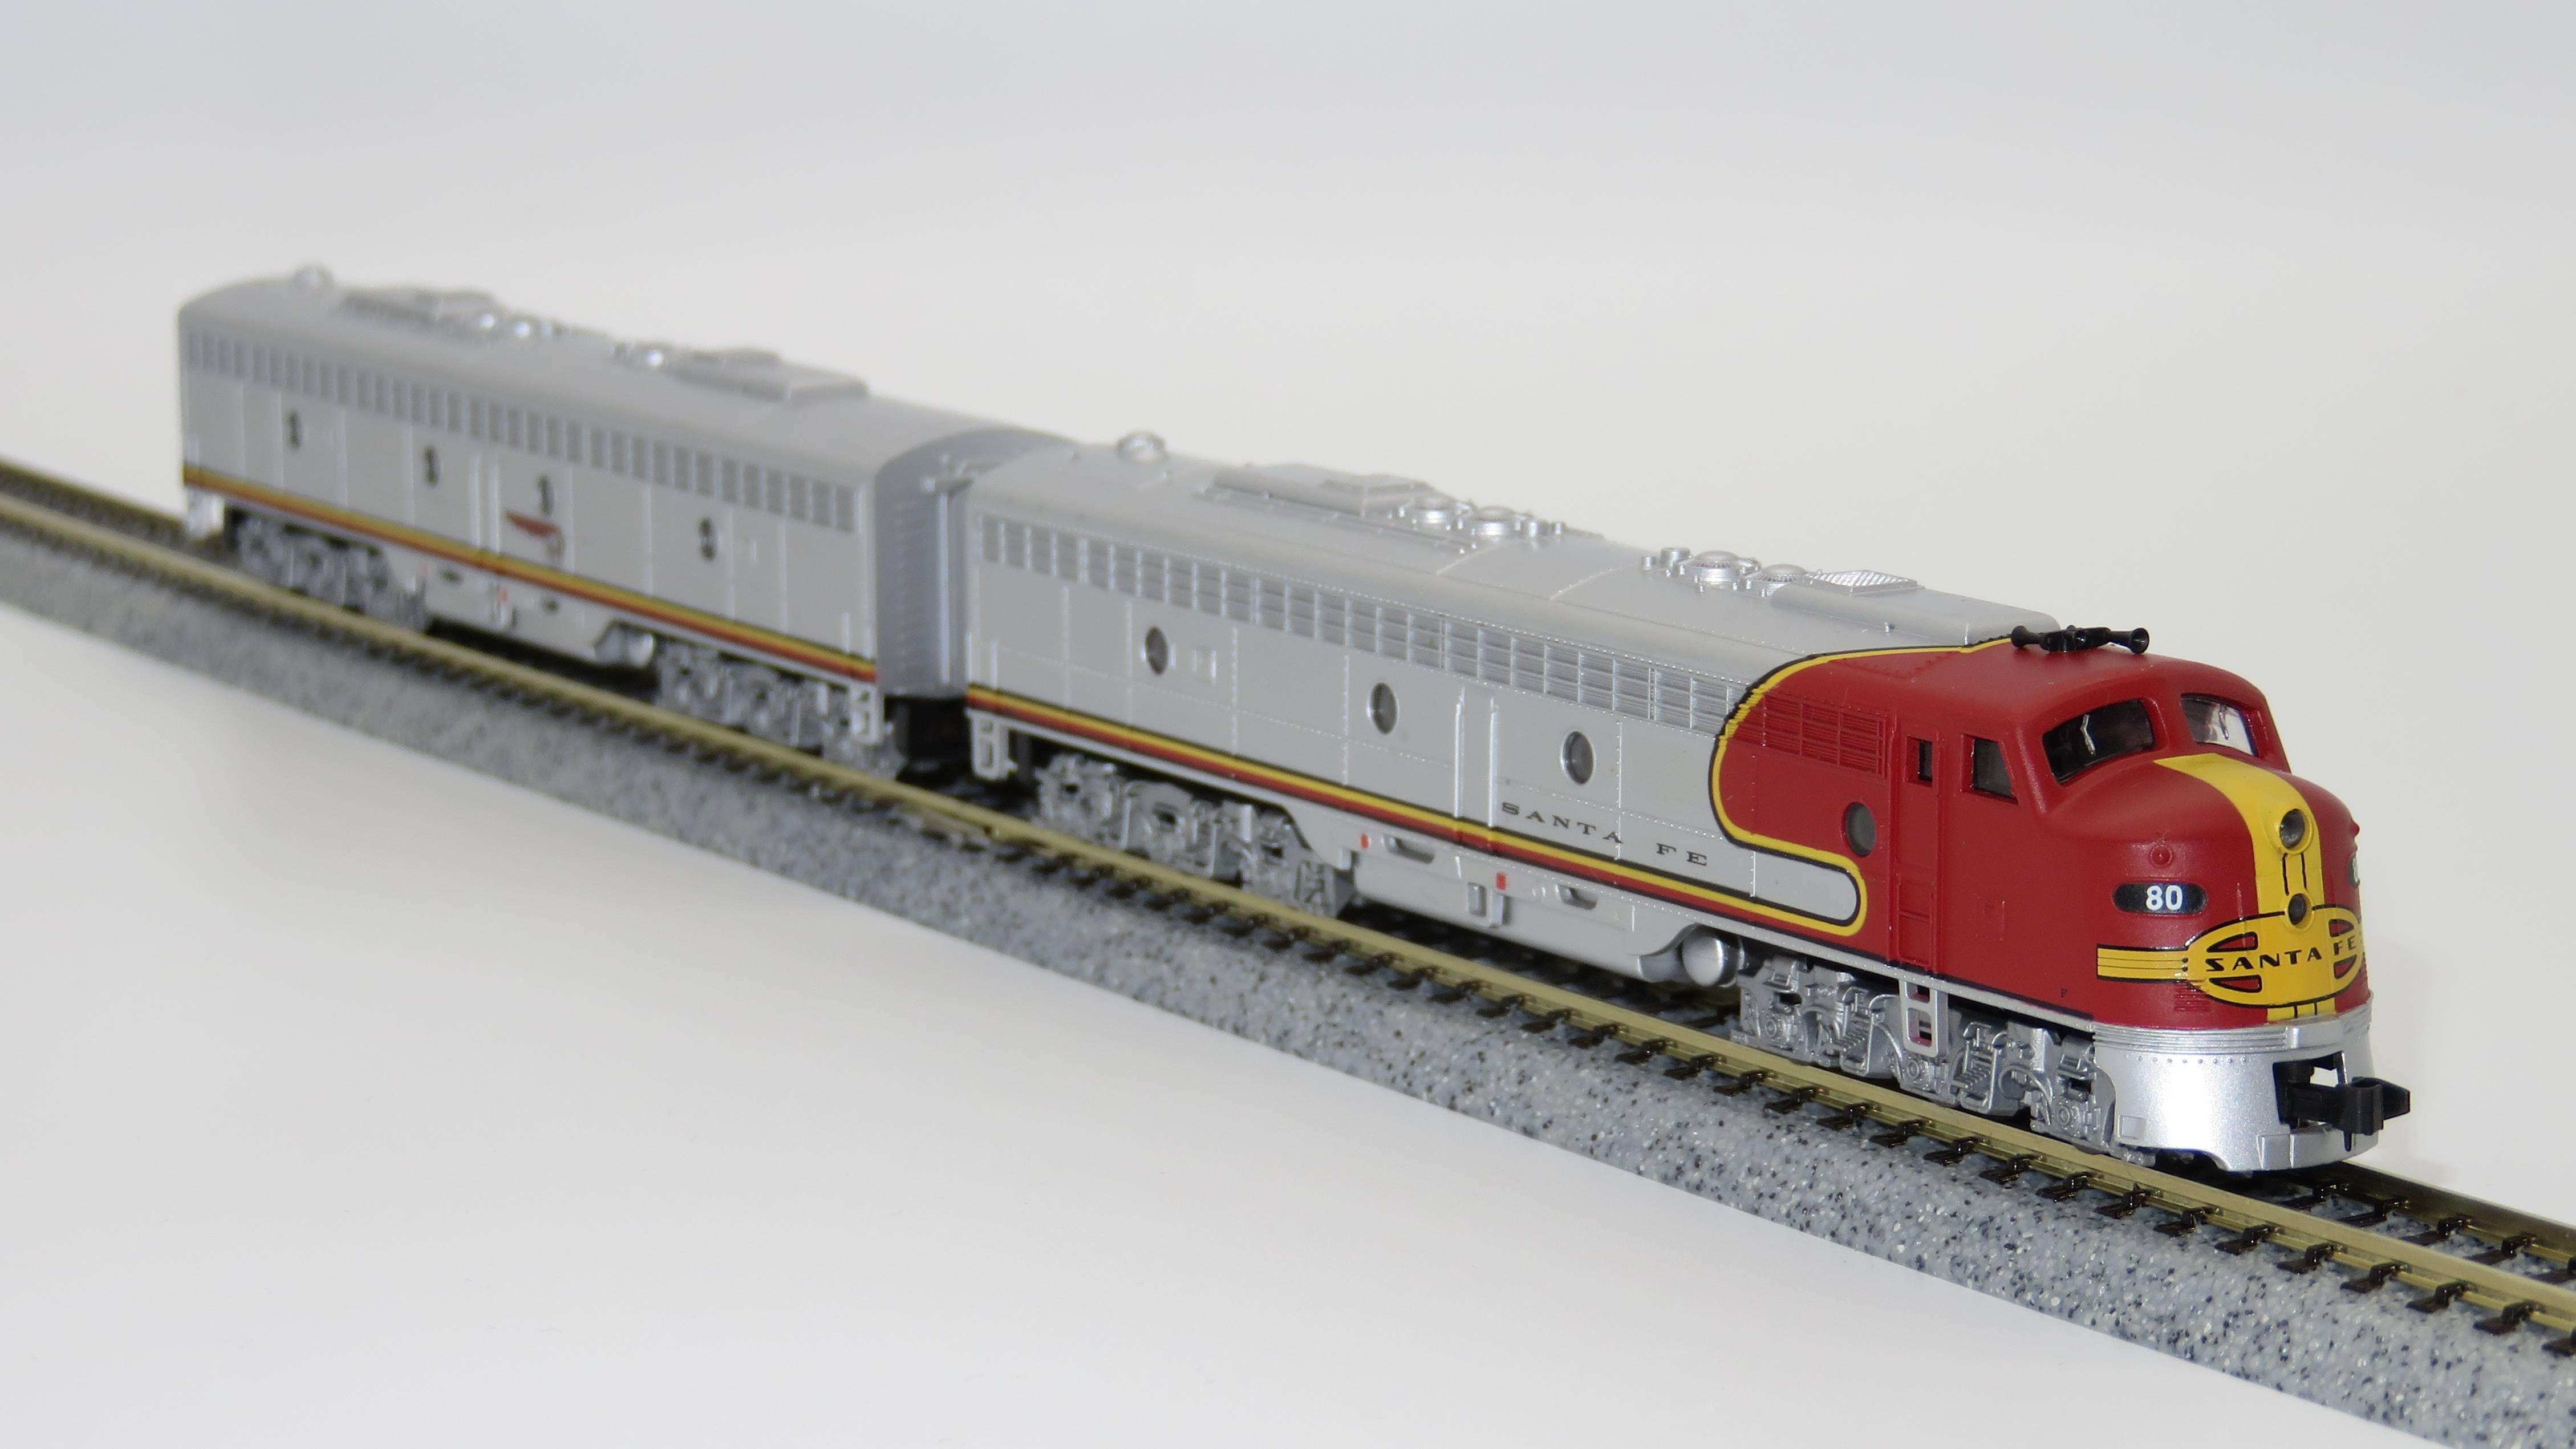 N Scale - Life-Like - 7827 - Locomotive, Diesel, EMD E8 - Santa Fe - 80L, 80A